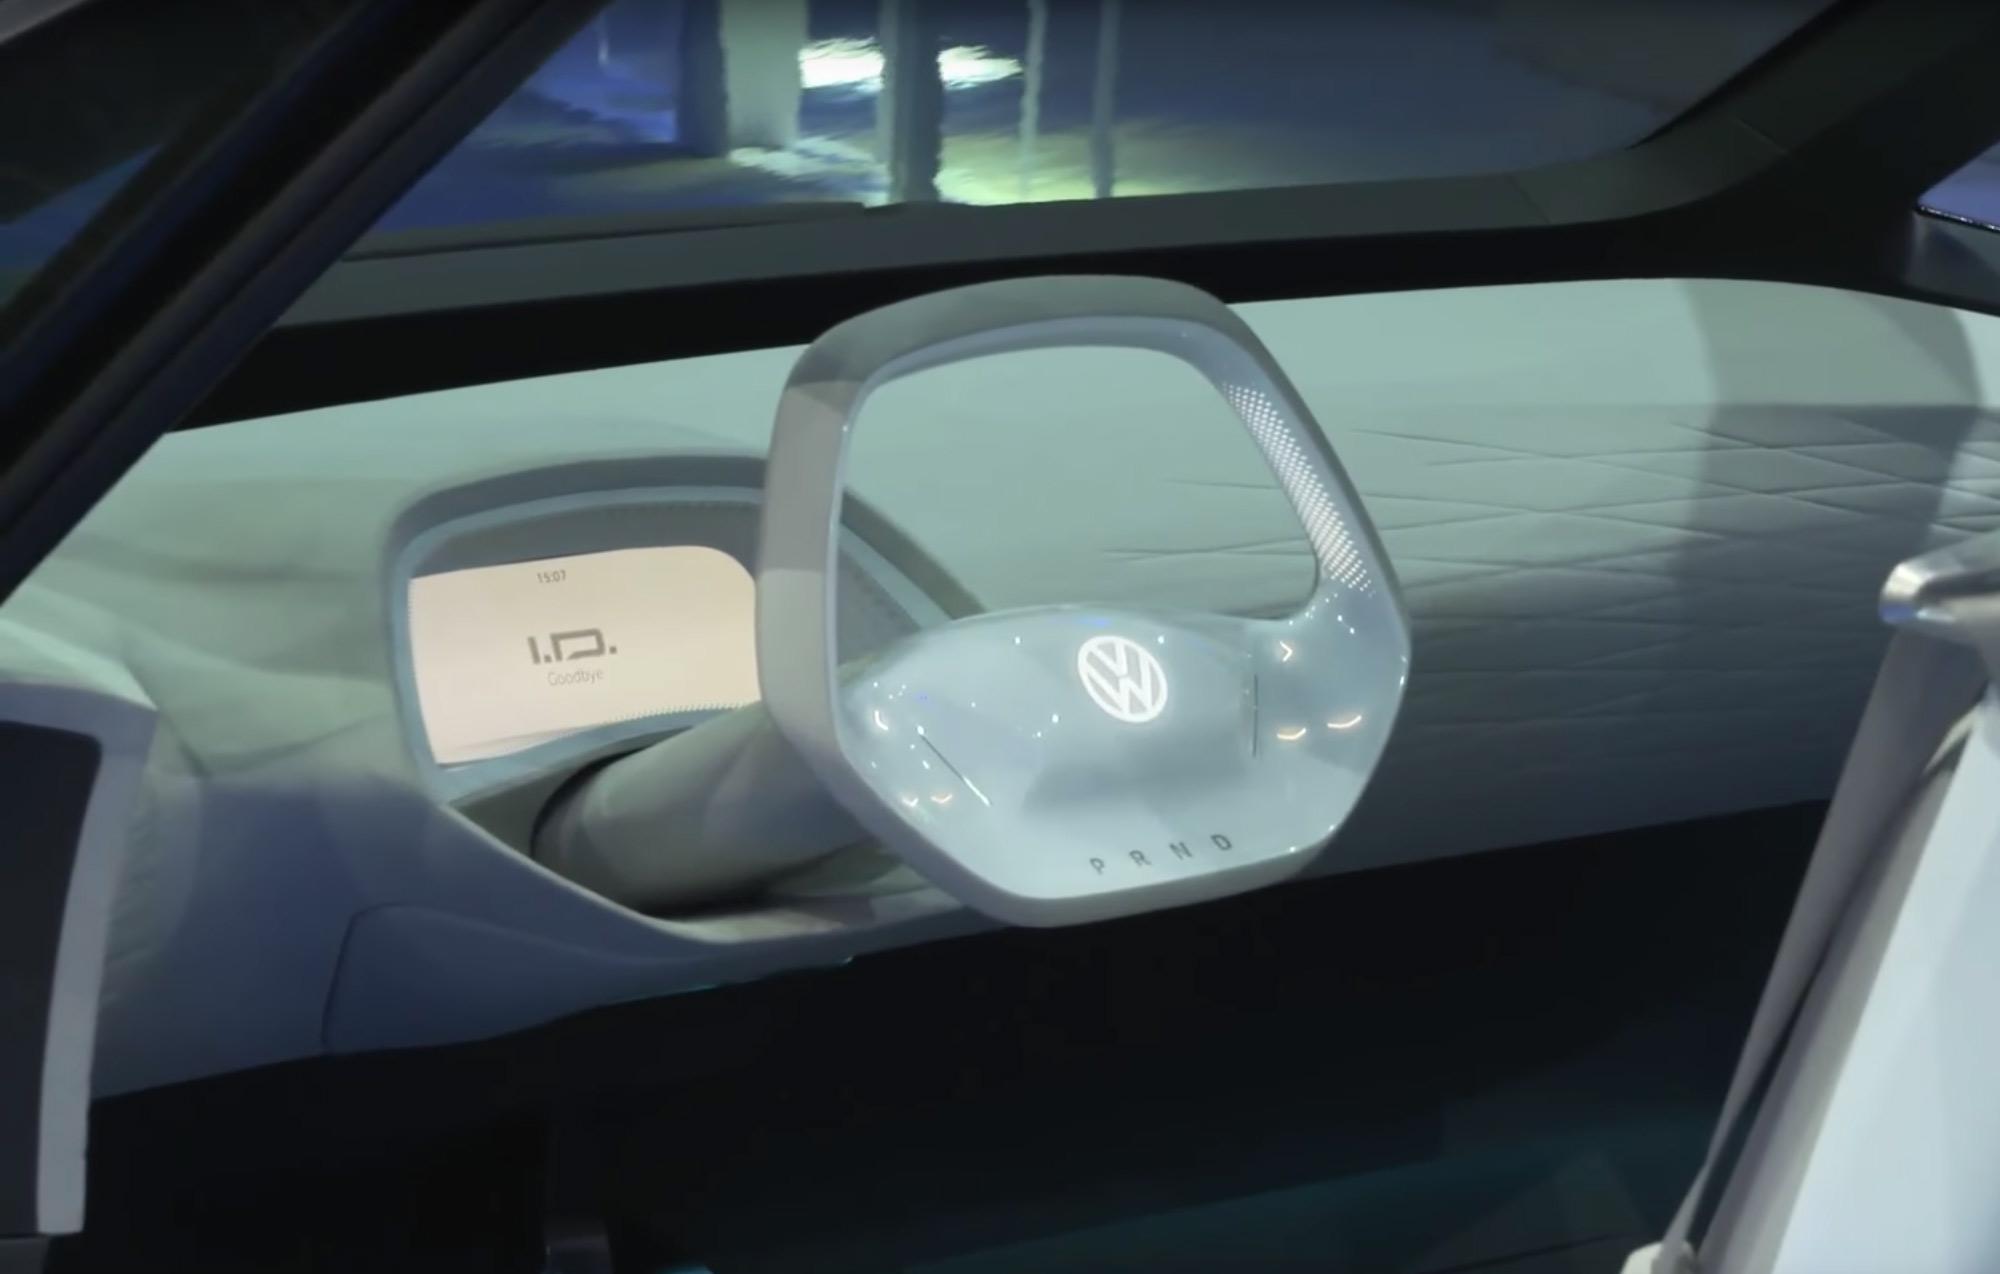 Volkswagen concept car I.D. dashboard